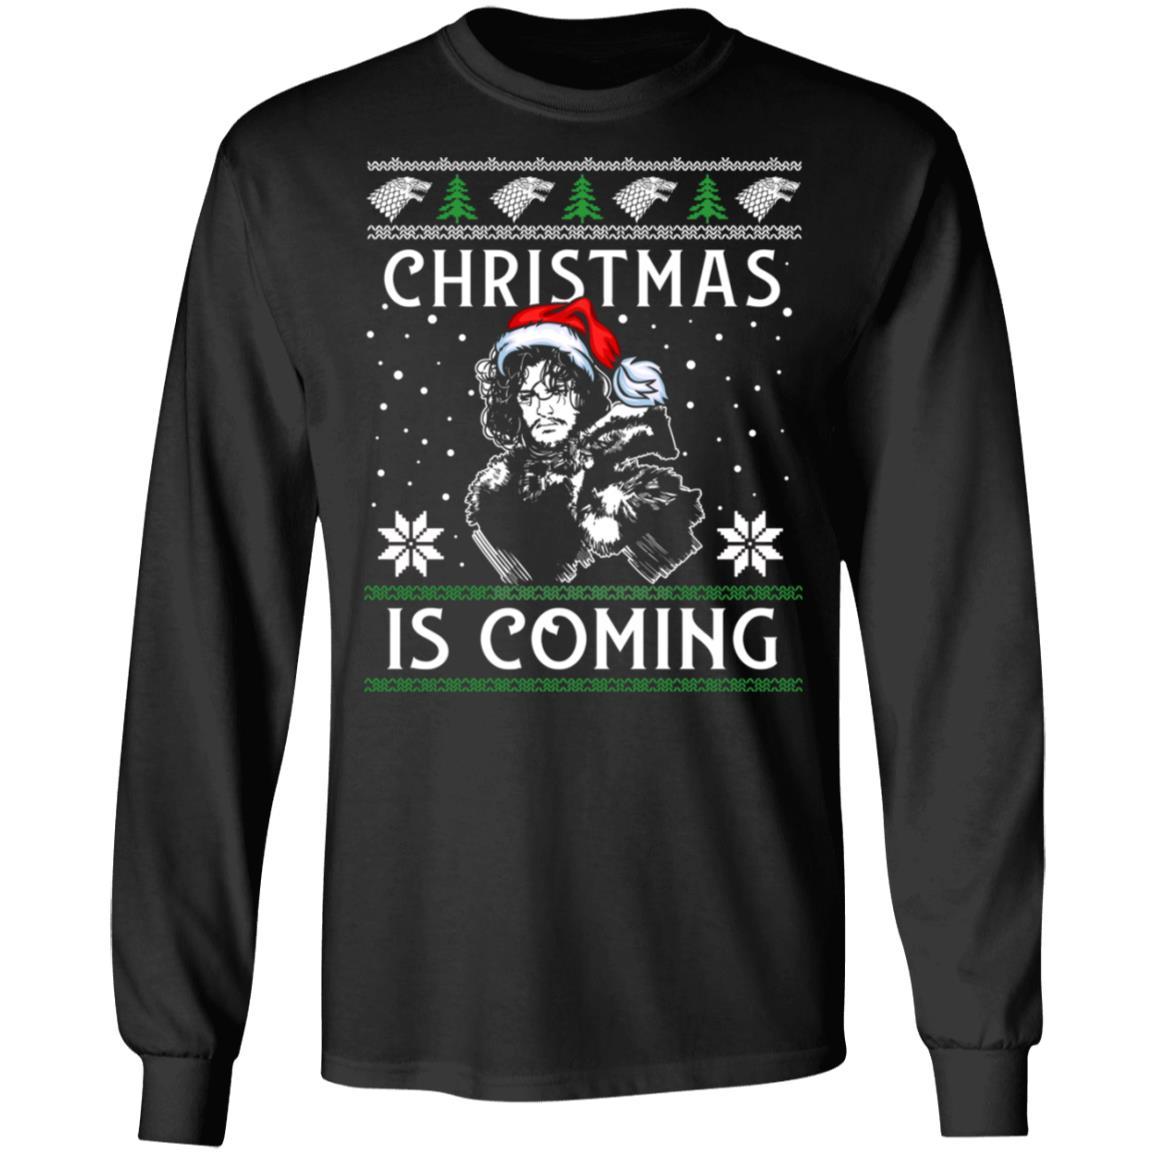 Merry Christmas Reindeers w//Snow Racerback Tank Top Xmas Stitch Ugly Tee